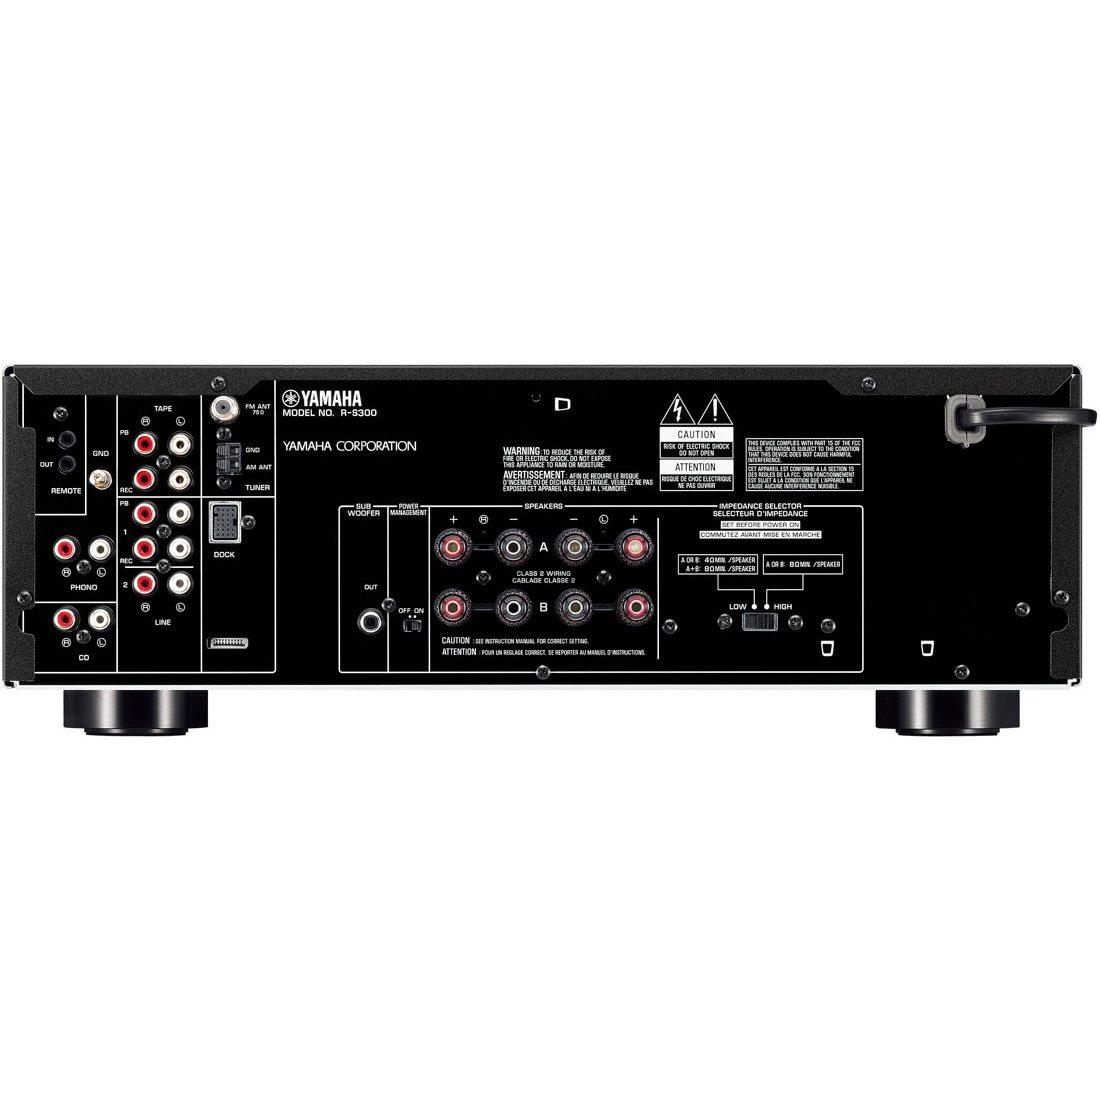 r s300 downloads hi fi components audio visual products rh usa yamaha com Yamaha RS500 Yamaha R 300